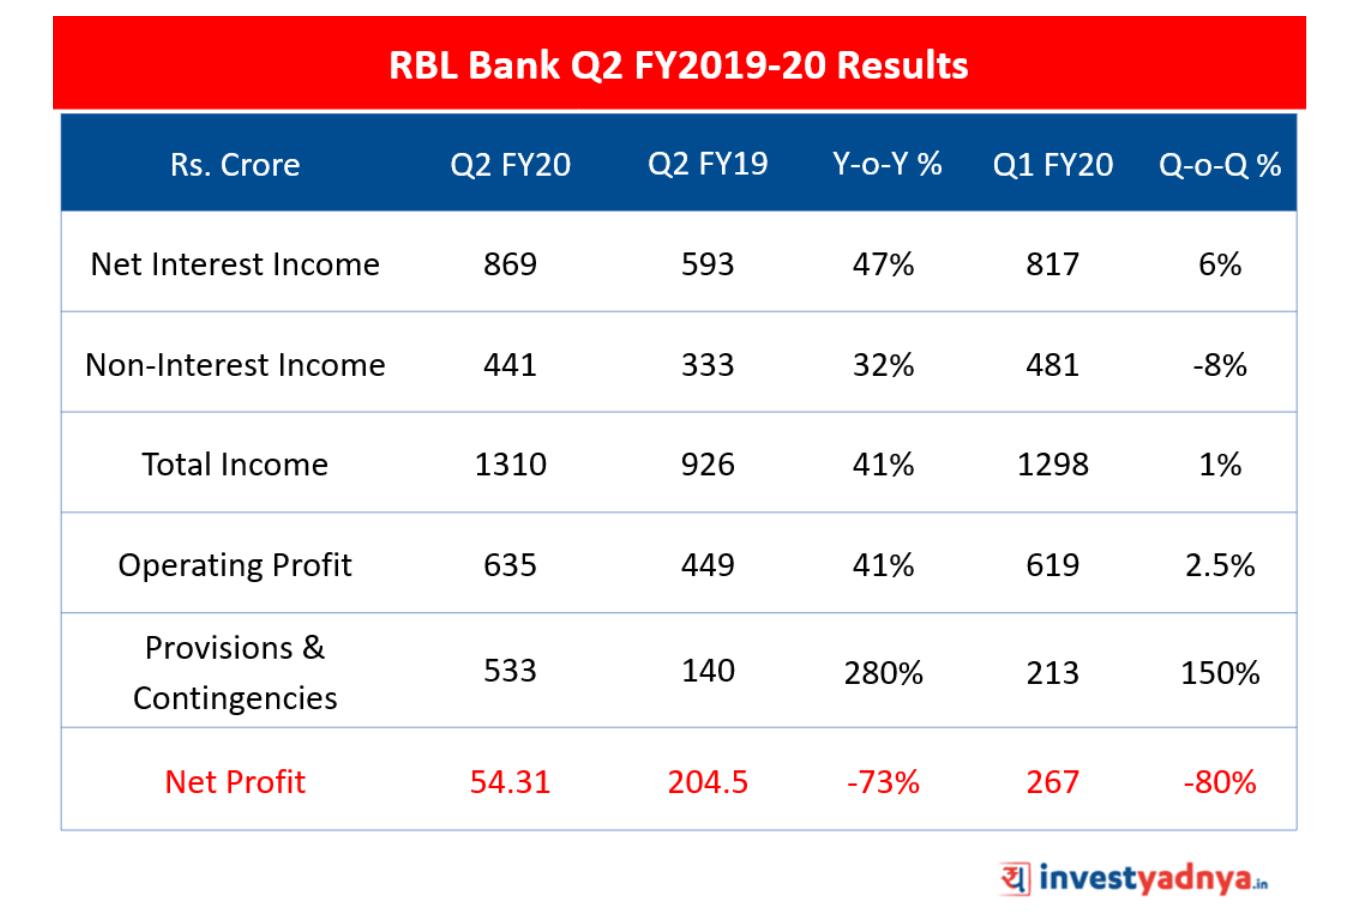 RBL Bank Q2 FY2019-20 Results